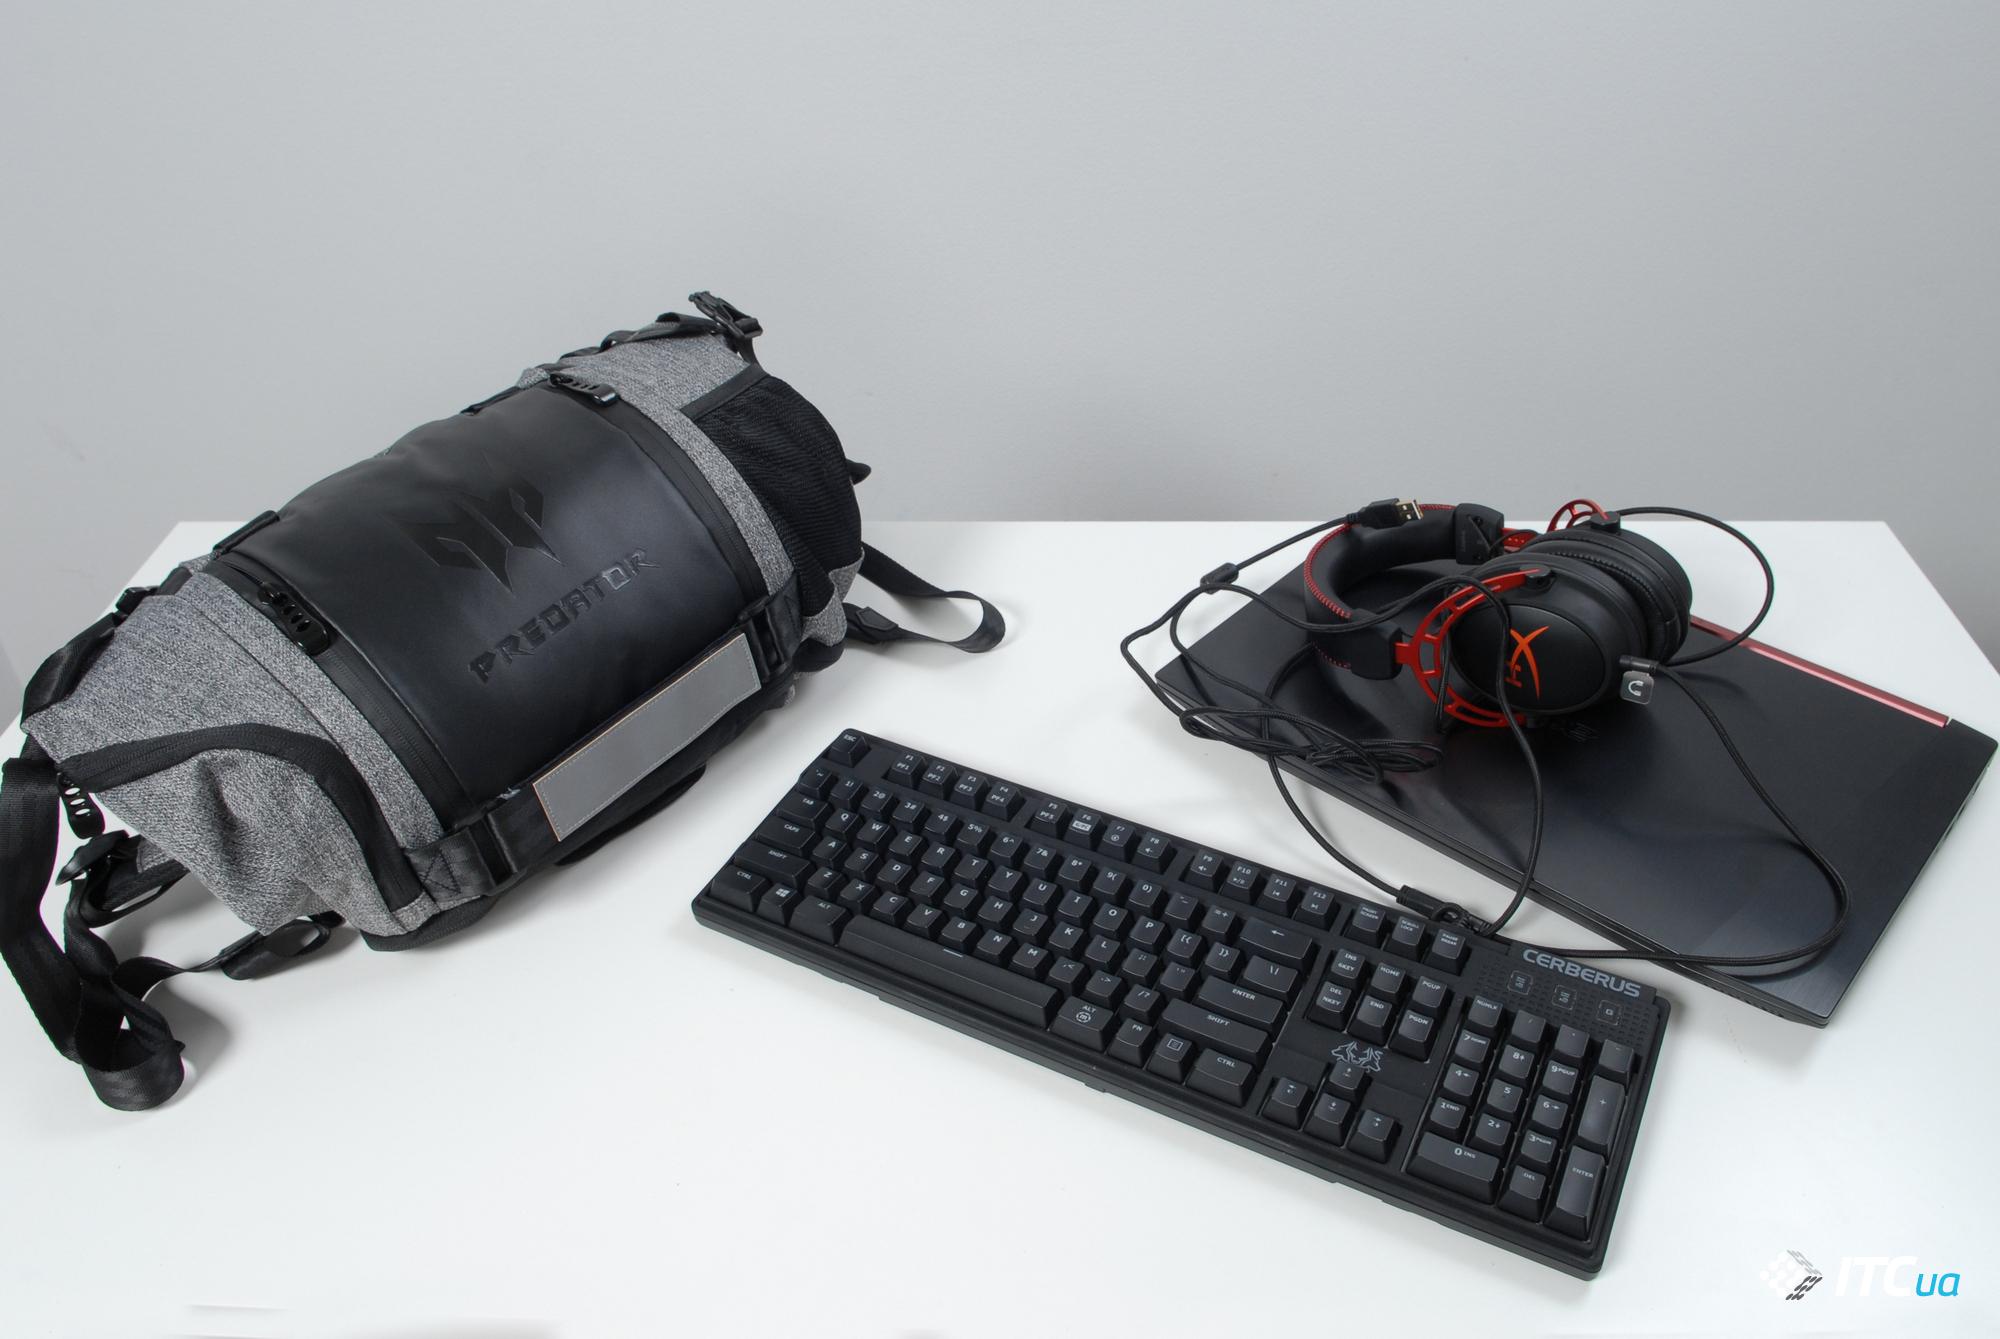 Обзор рюкзака Acer Predator Gaming Rolltop Backpack